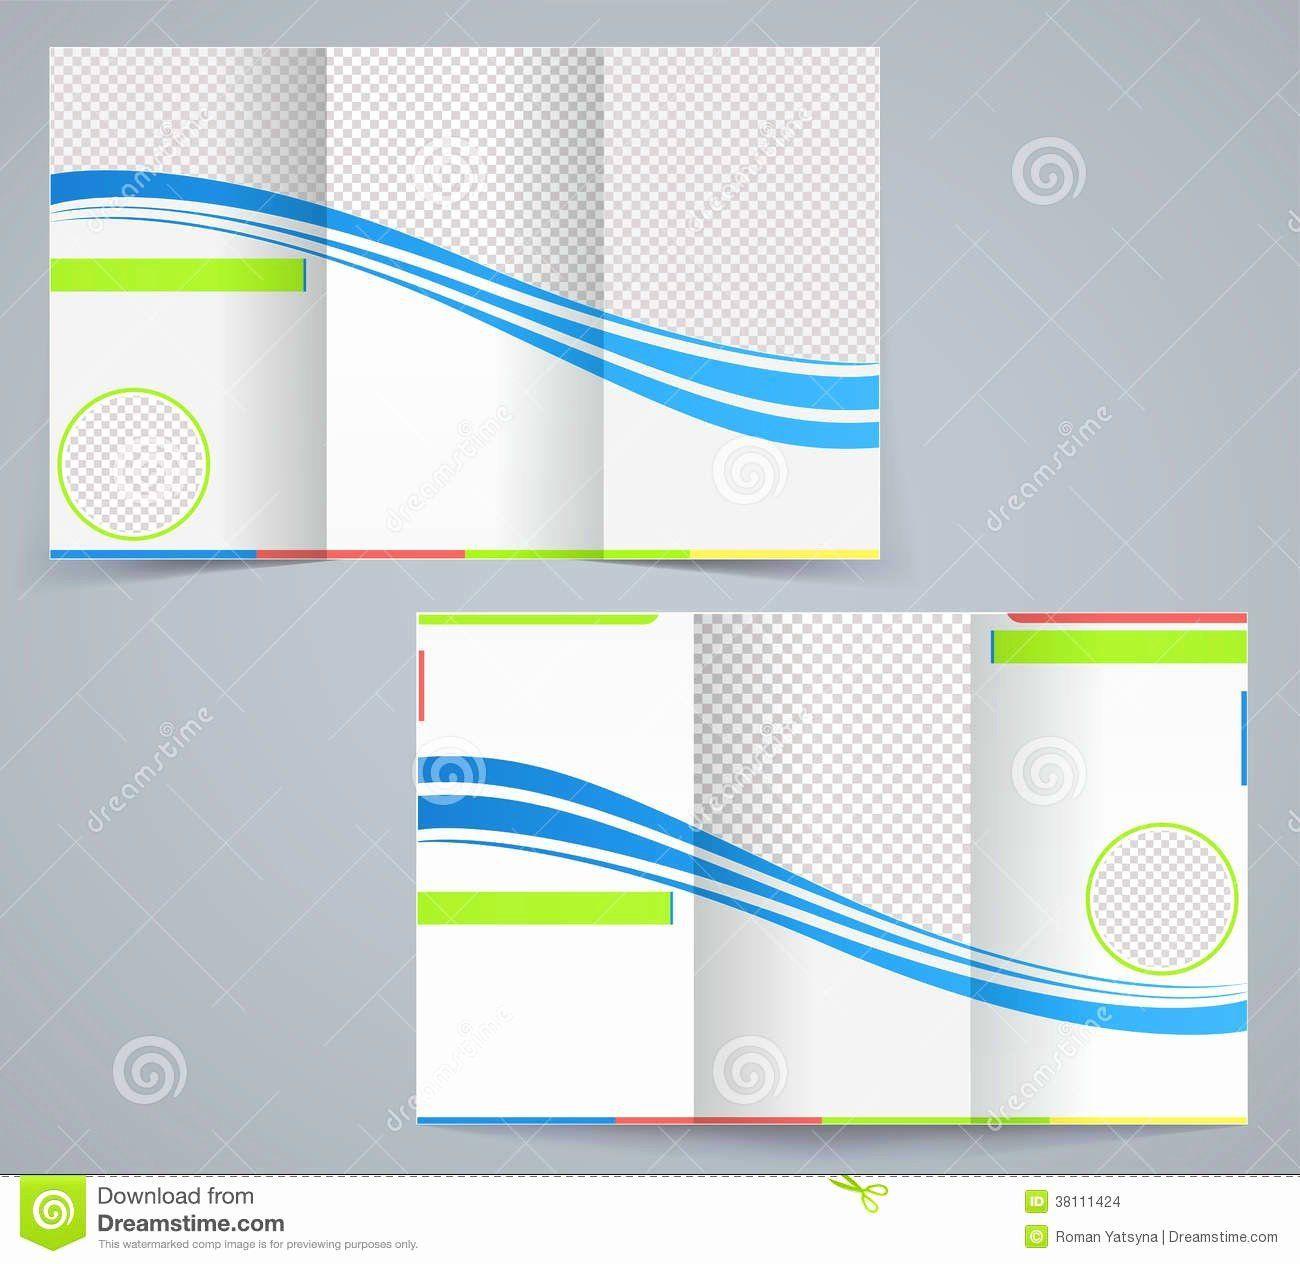 000 Shocking Word Tri Fold Brochure Template Photo  2010 Microsoft M OfficeFull